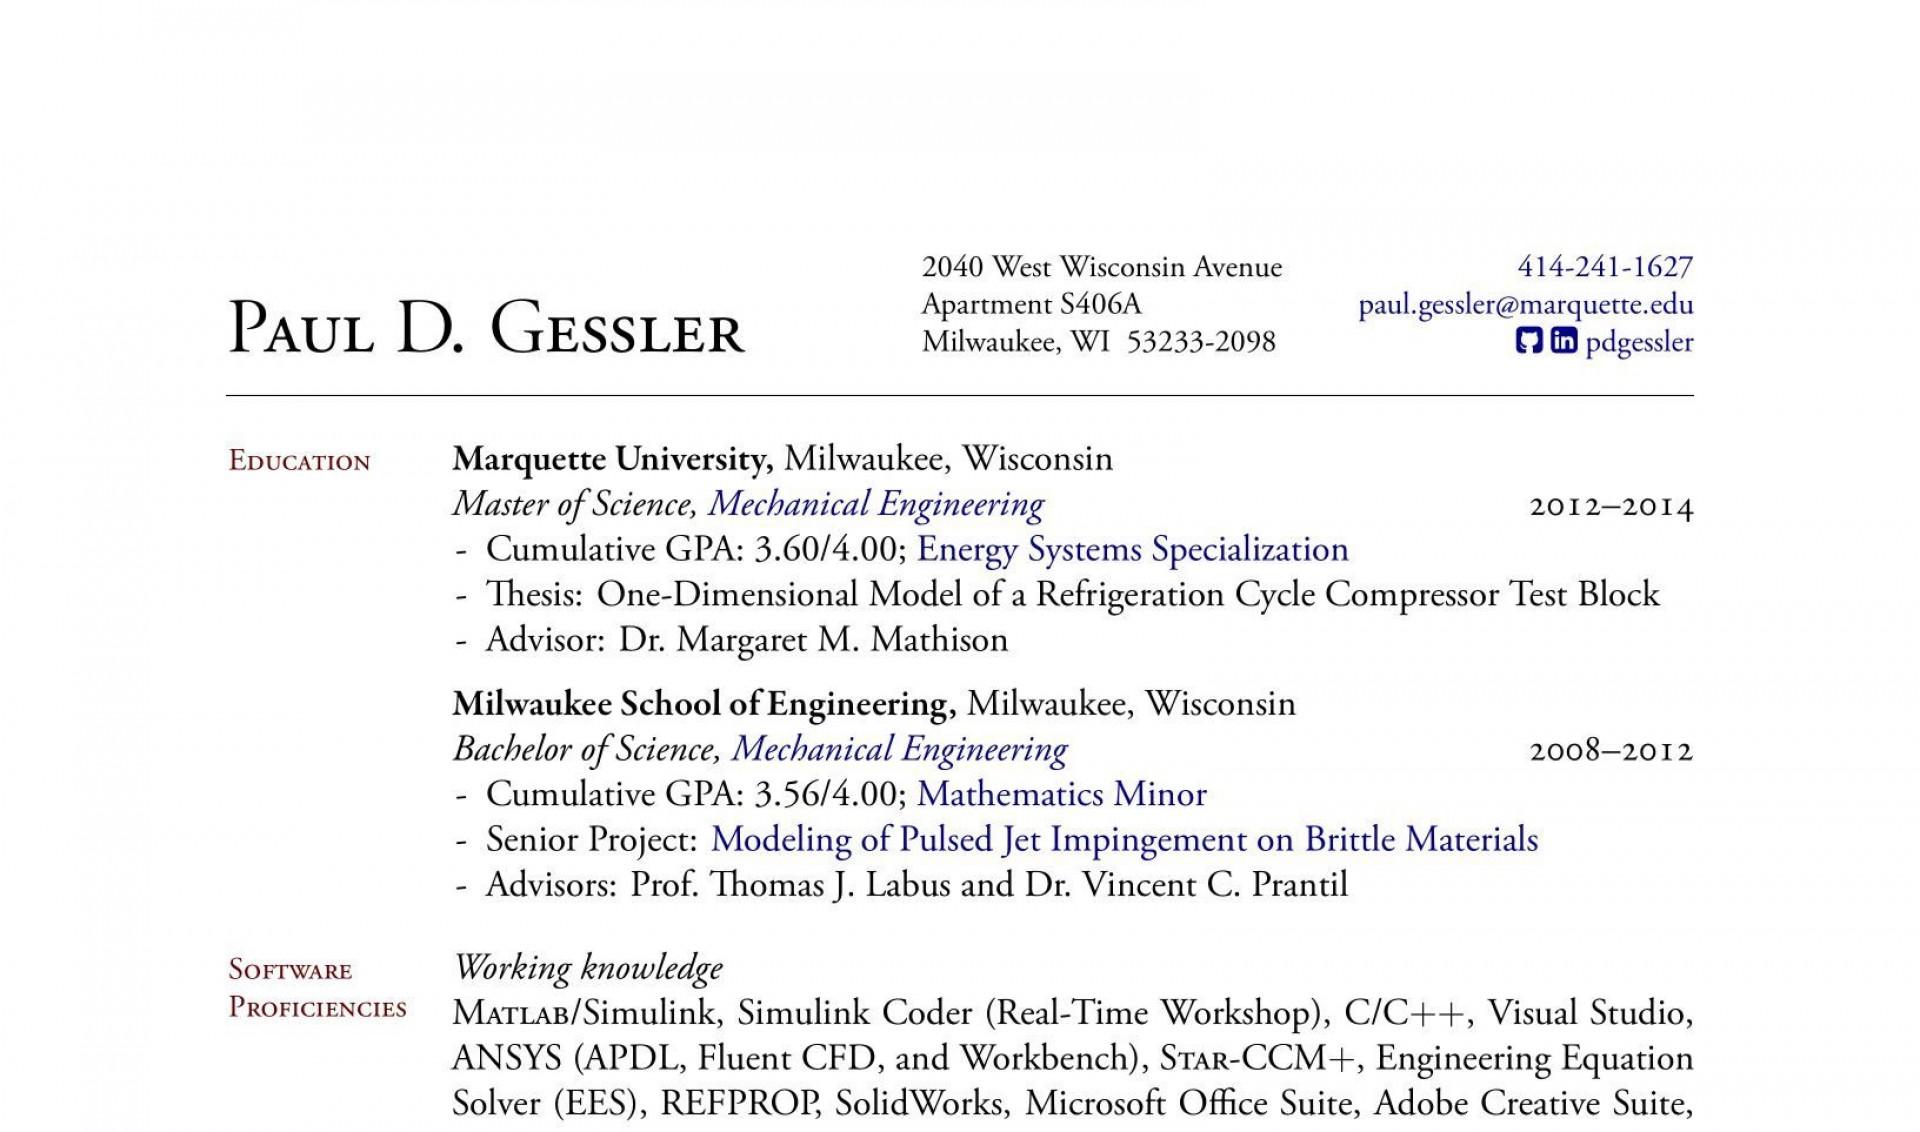 001 Breathtaking Latex Resume Template Phd Design  Cv Graduate Student Economic1920